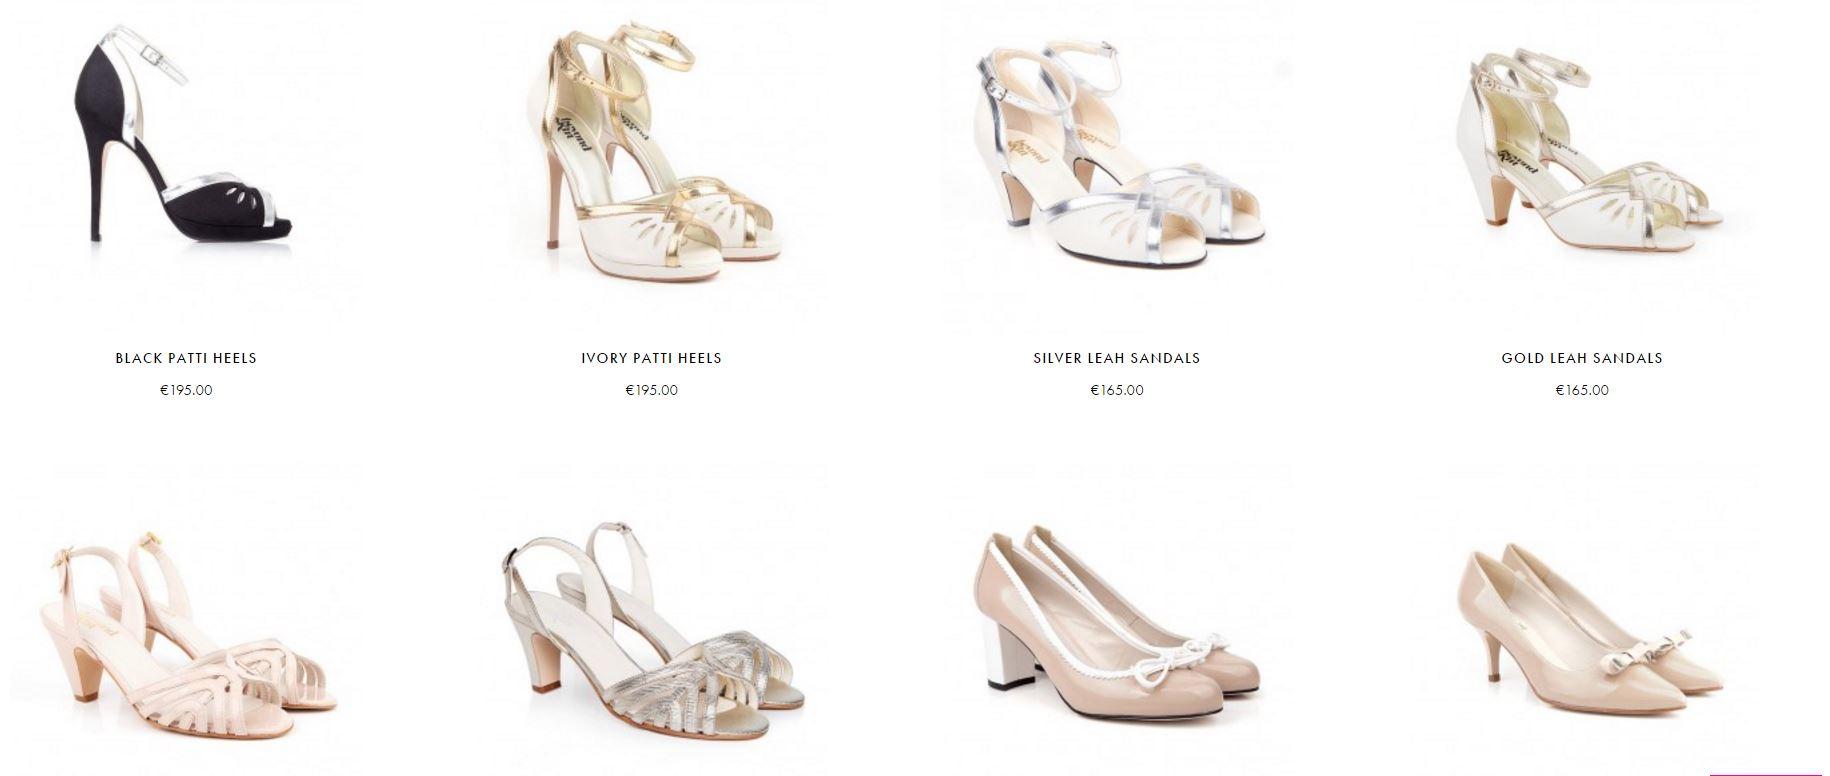 Chaussures Beyond skin